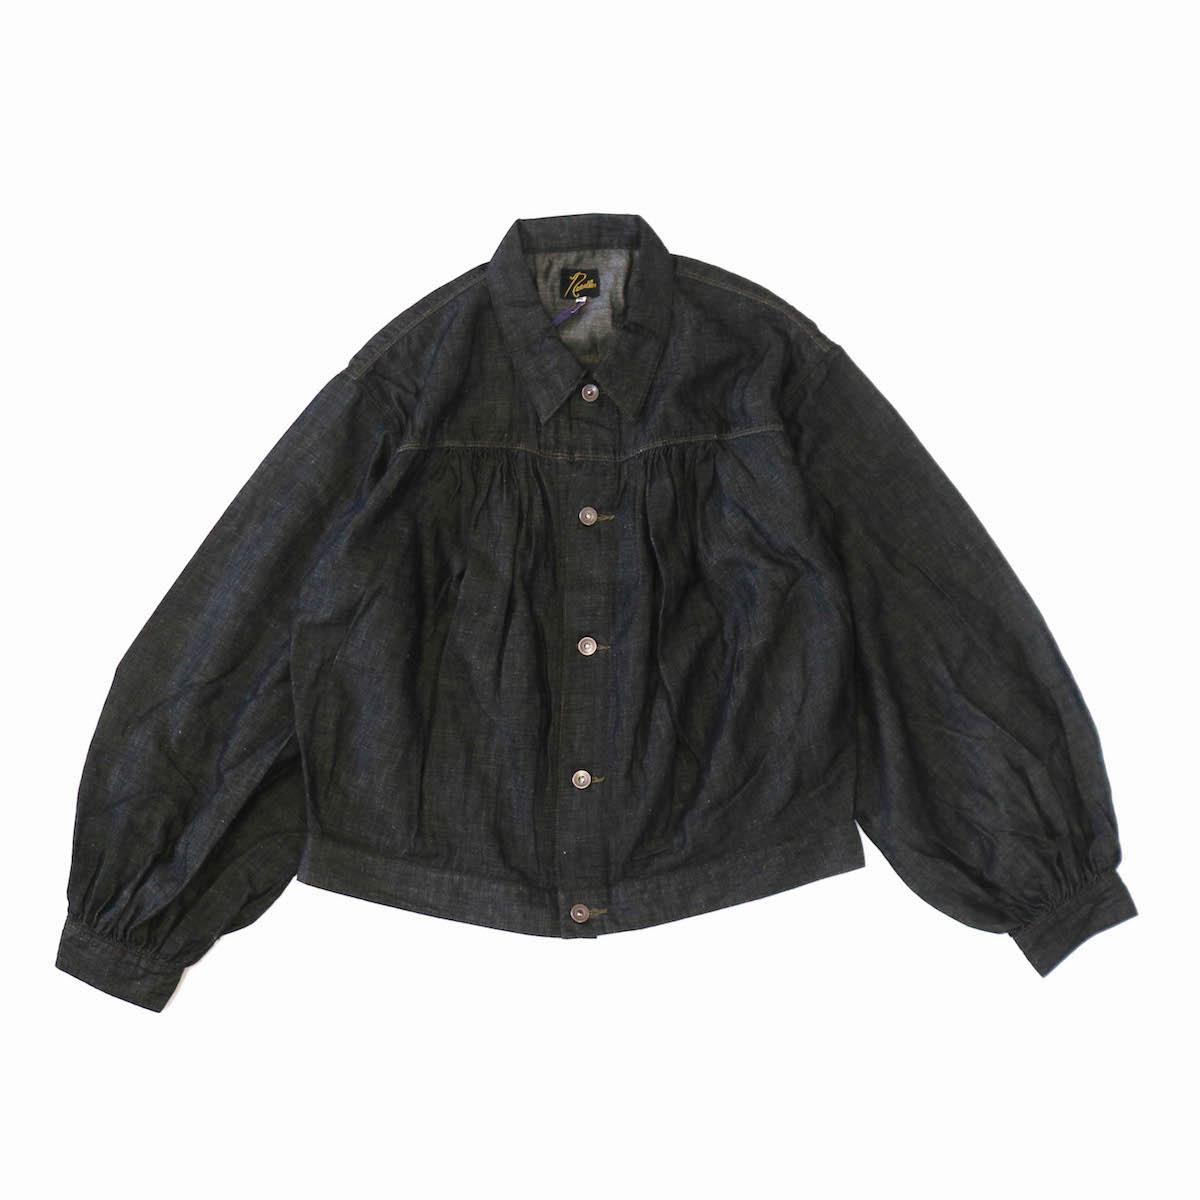 NEEDLES / Gathered Jean Jacket -6.5oz C/L Denim -BLACK